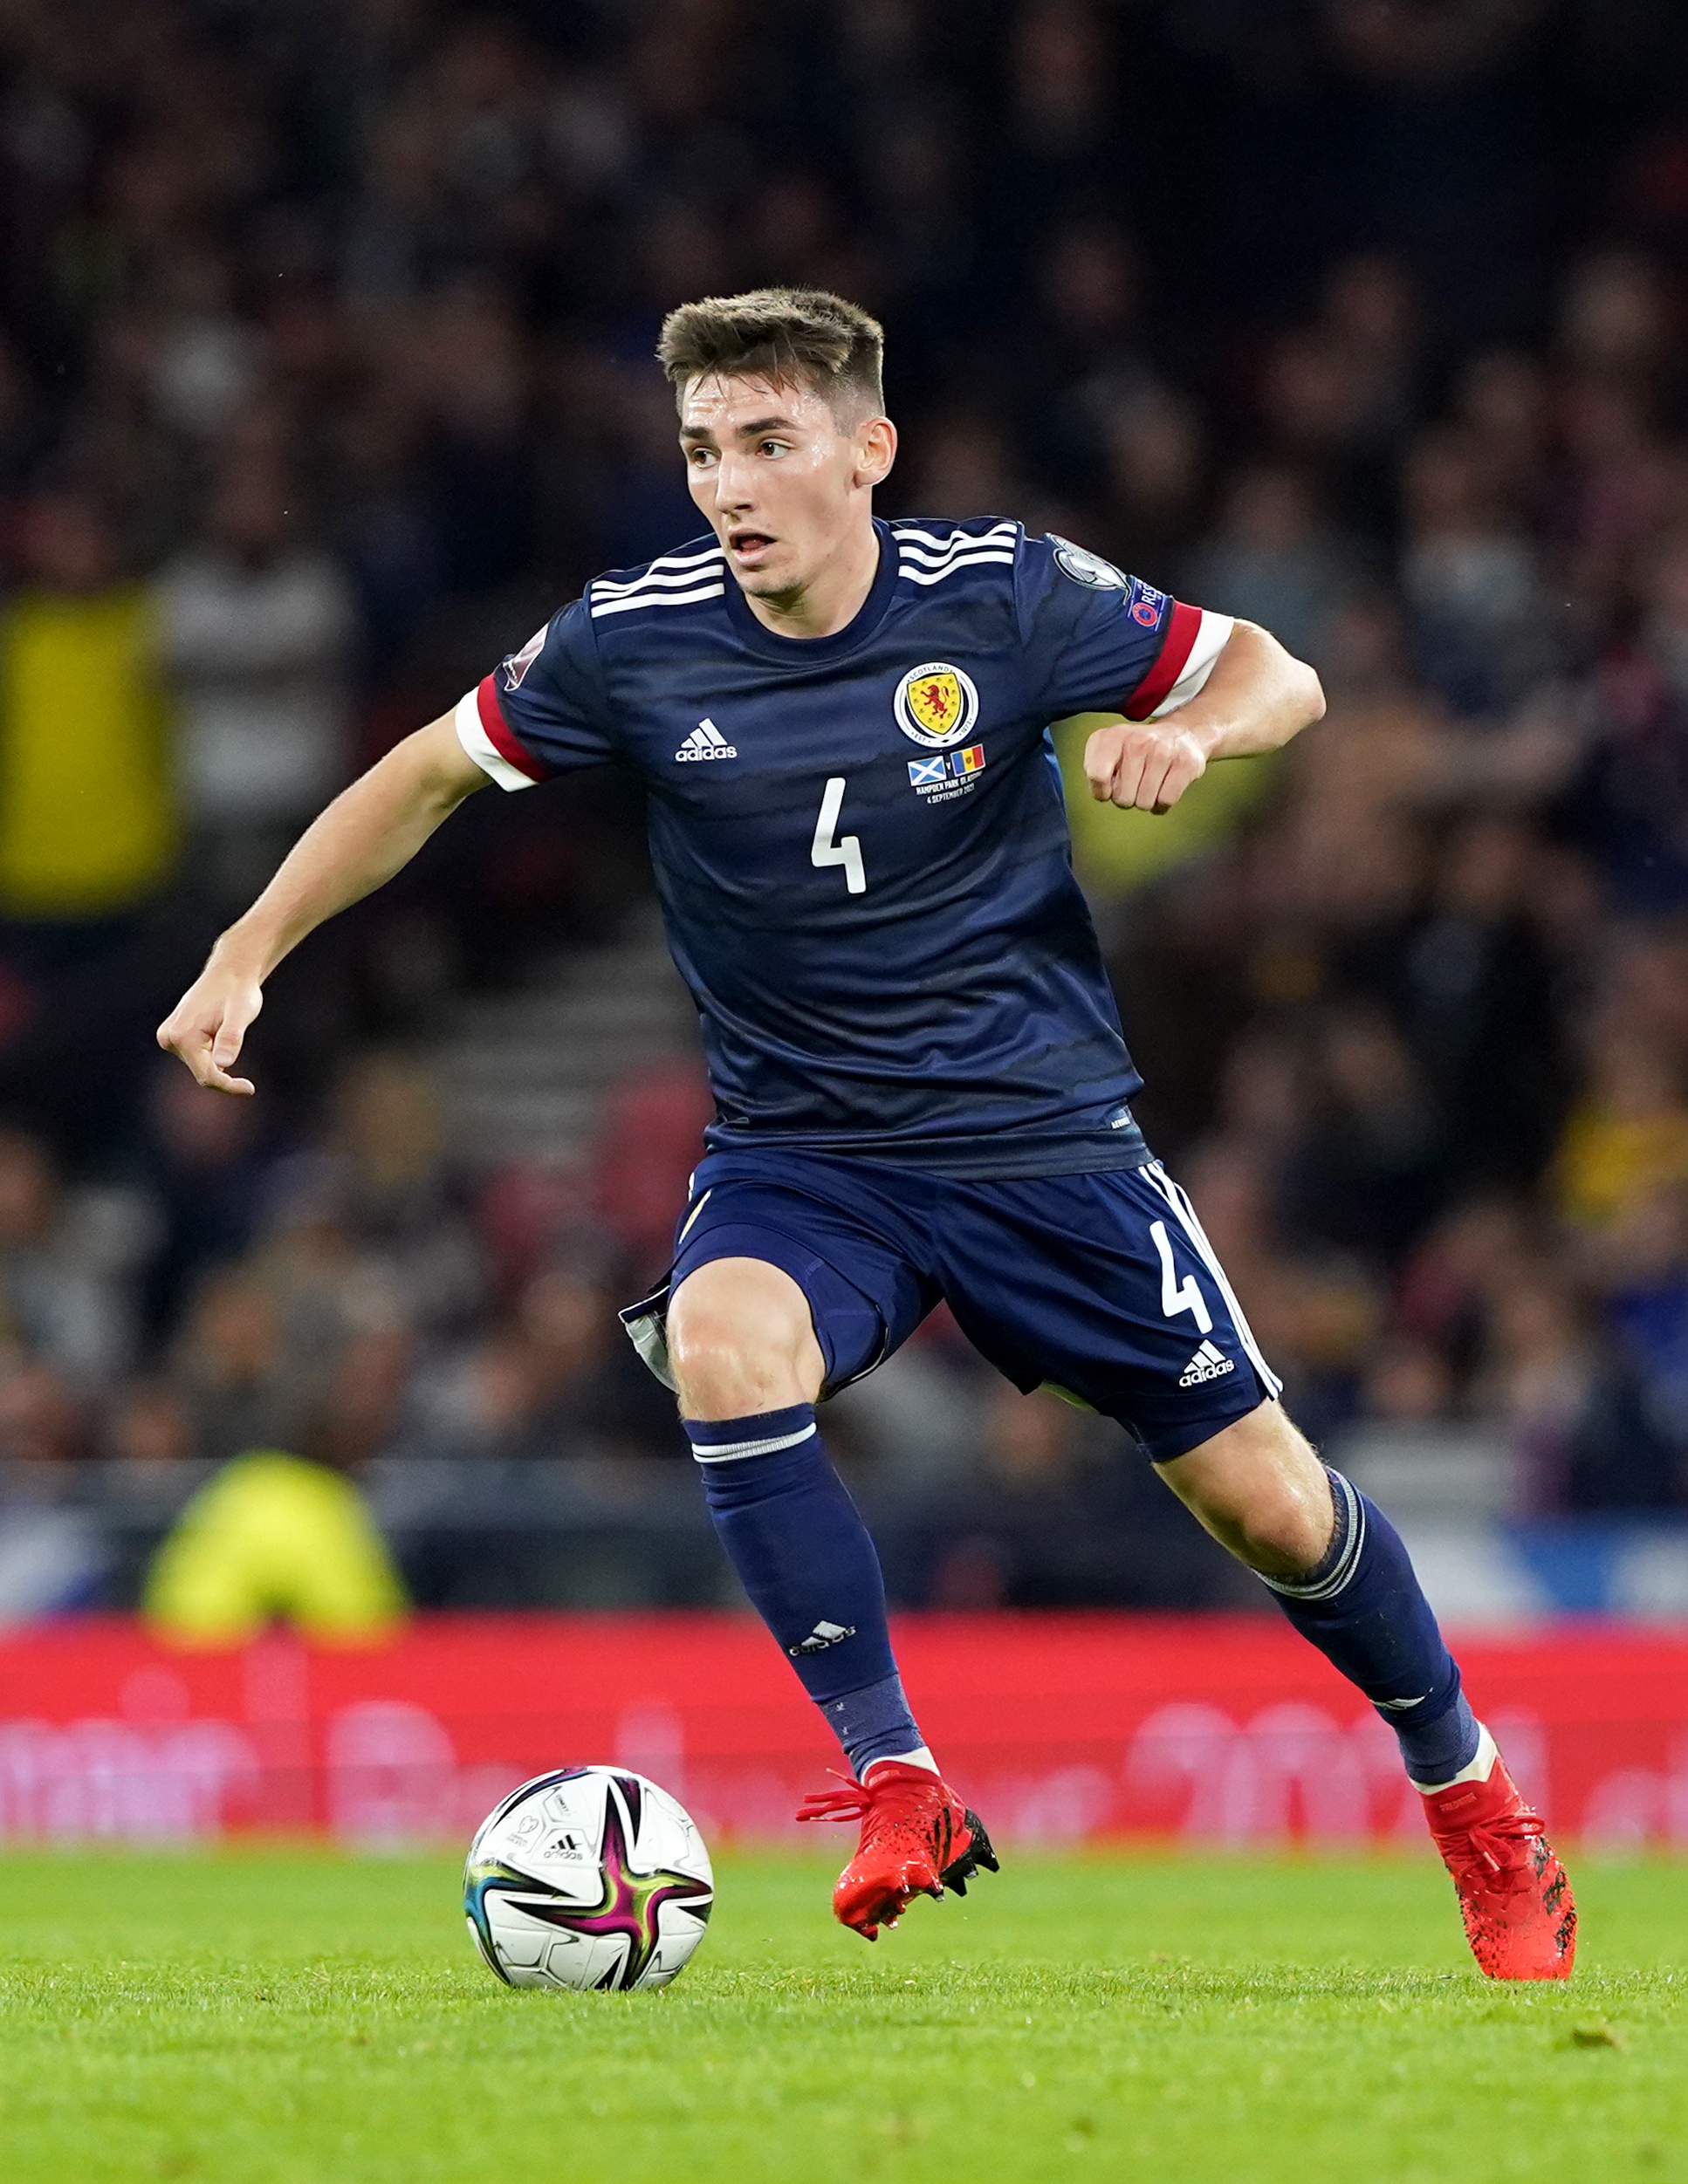 Scotland v Moldova - FIFA World Cup 2022 - European Qualifying - Group F - Hampden Park